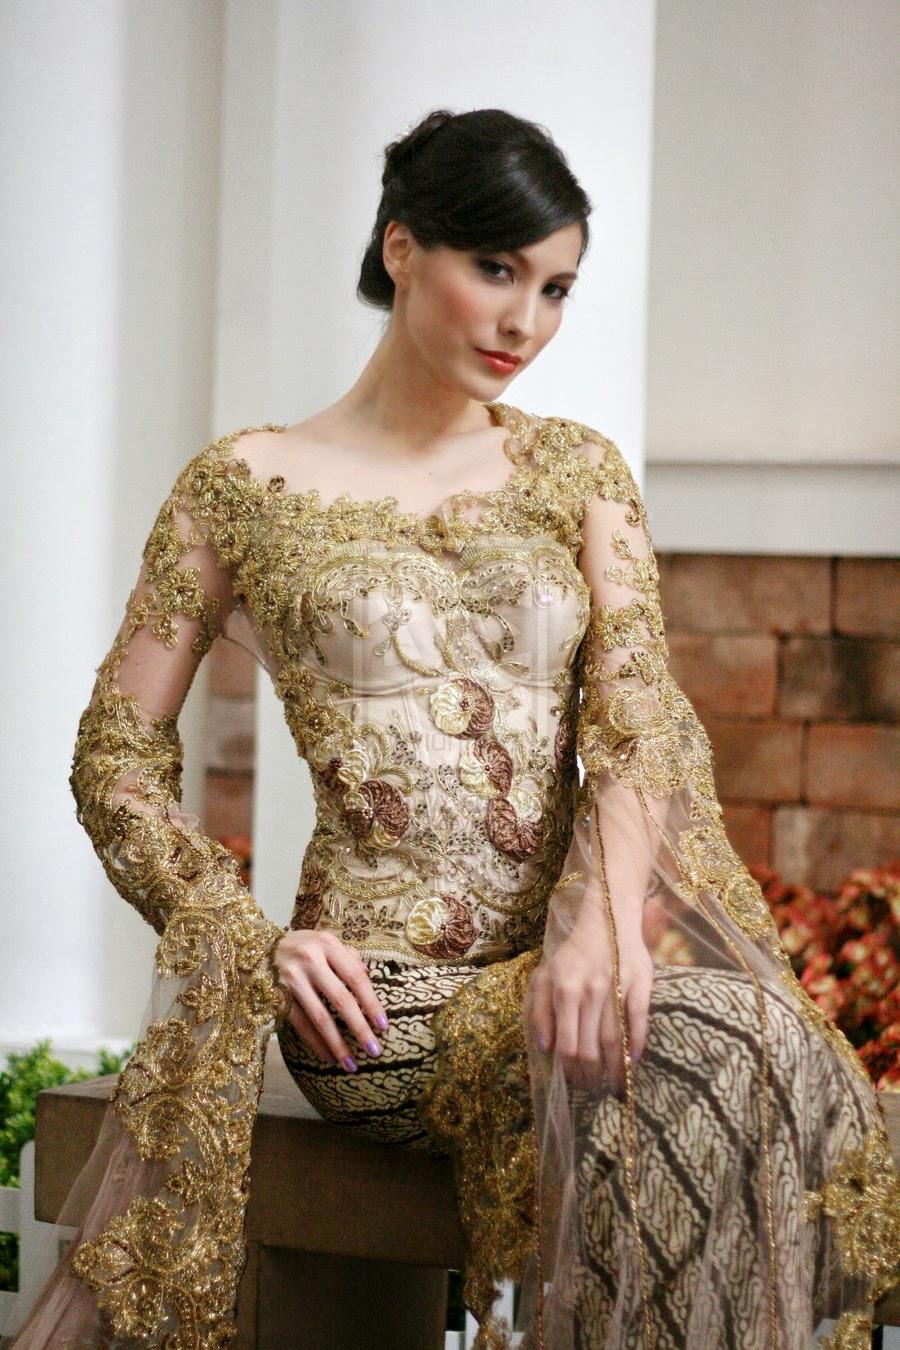 Image Result For Artis Indonesia Orang Batak